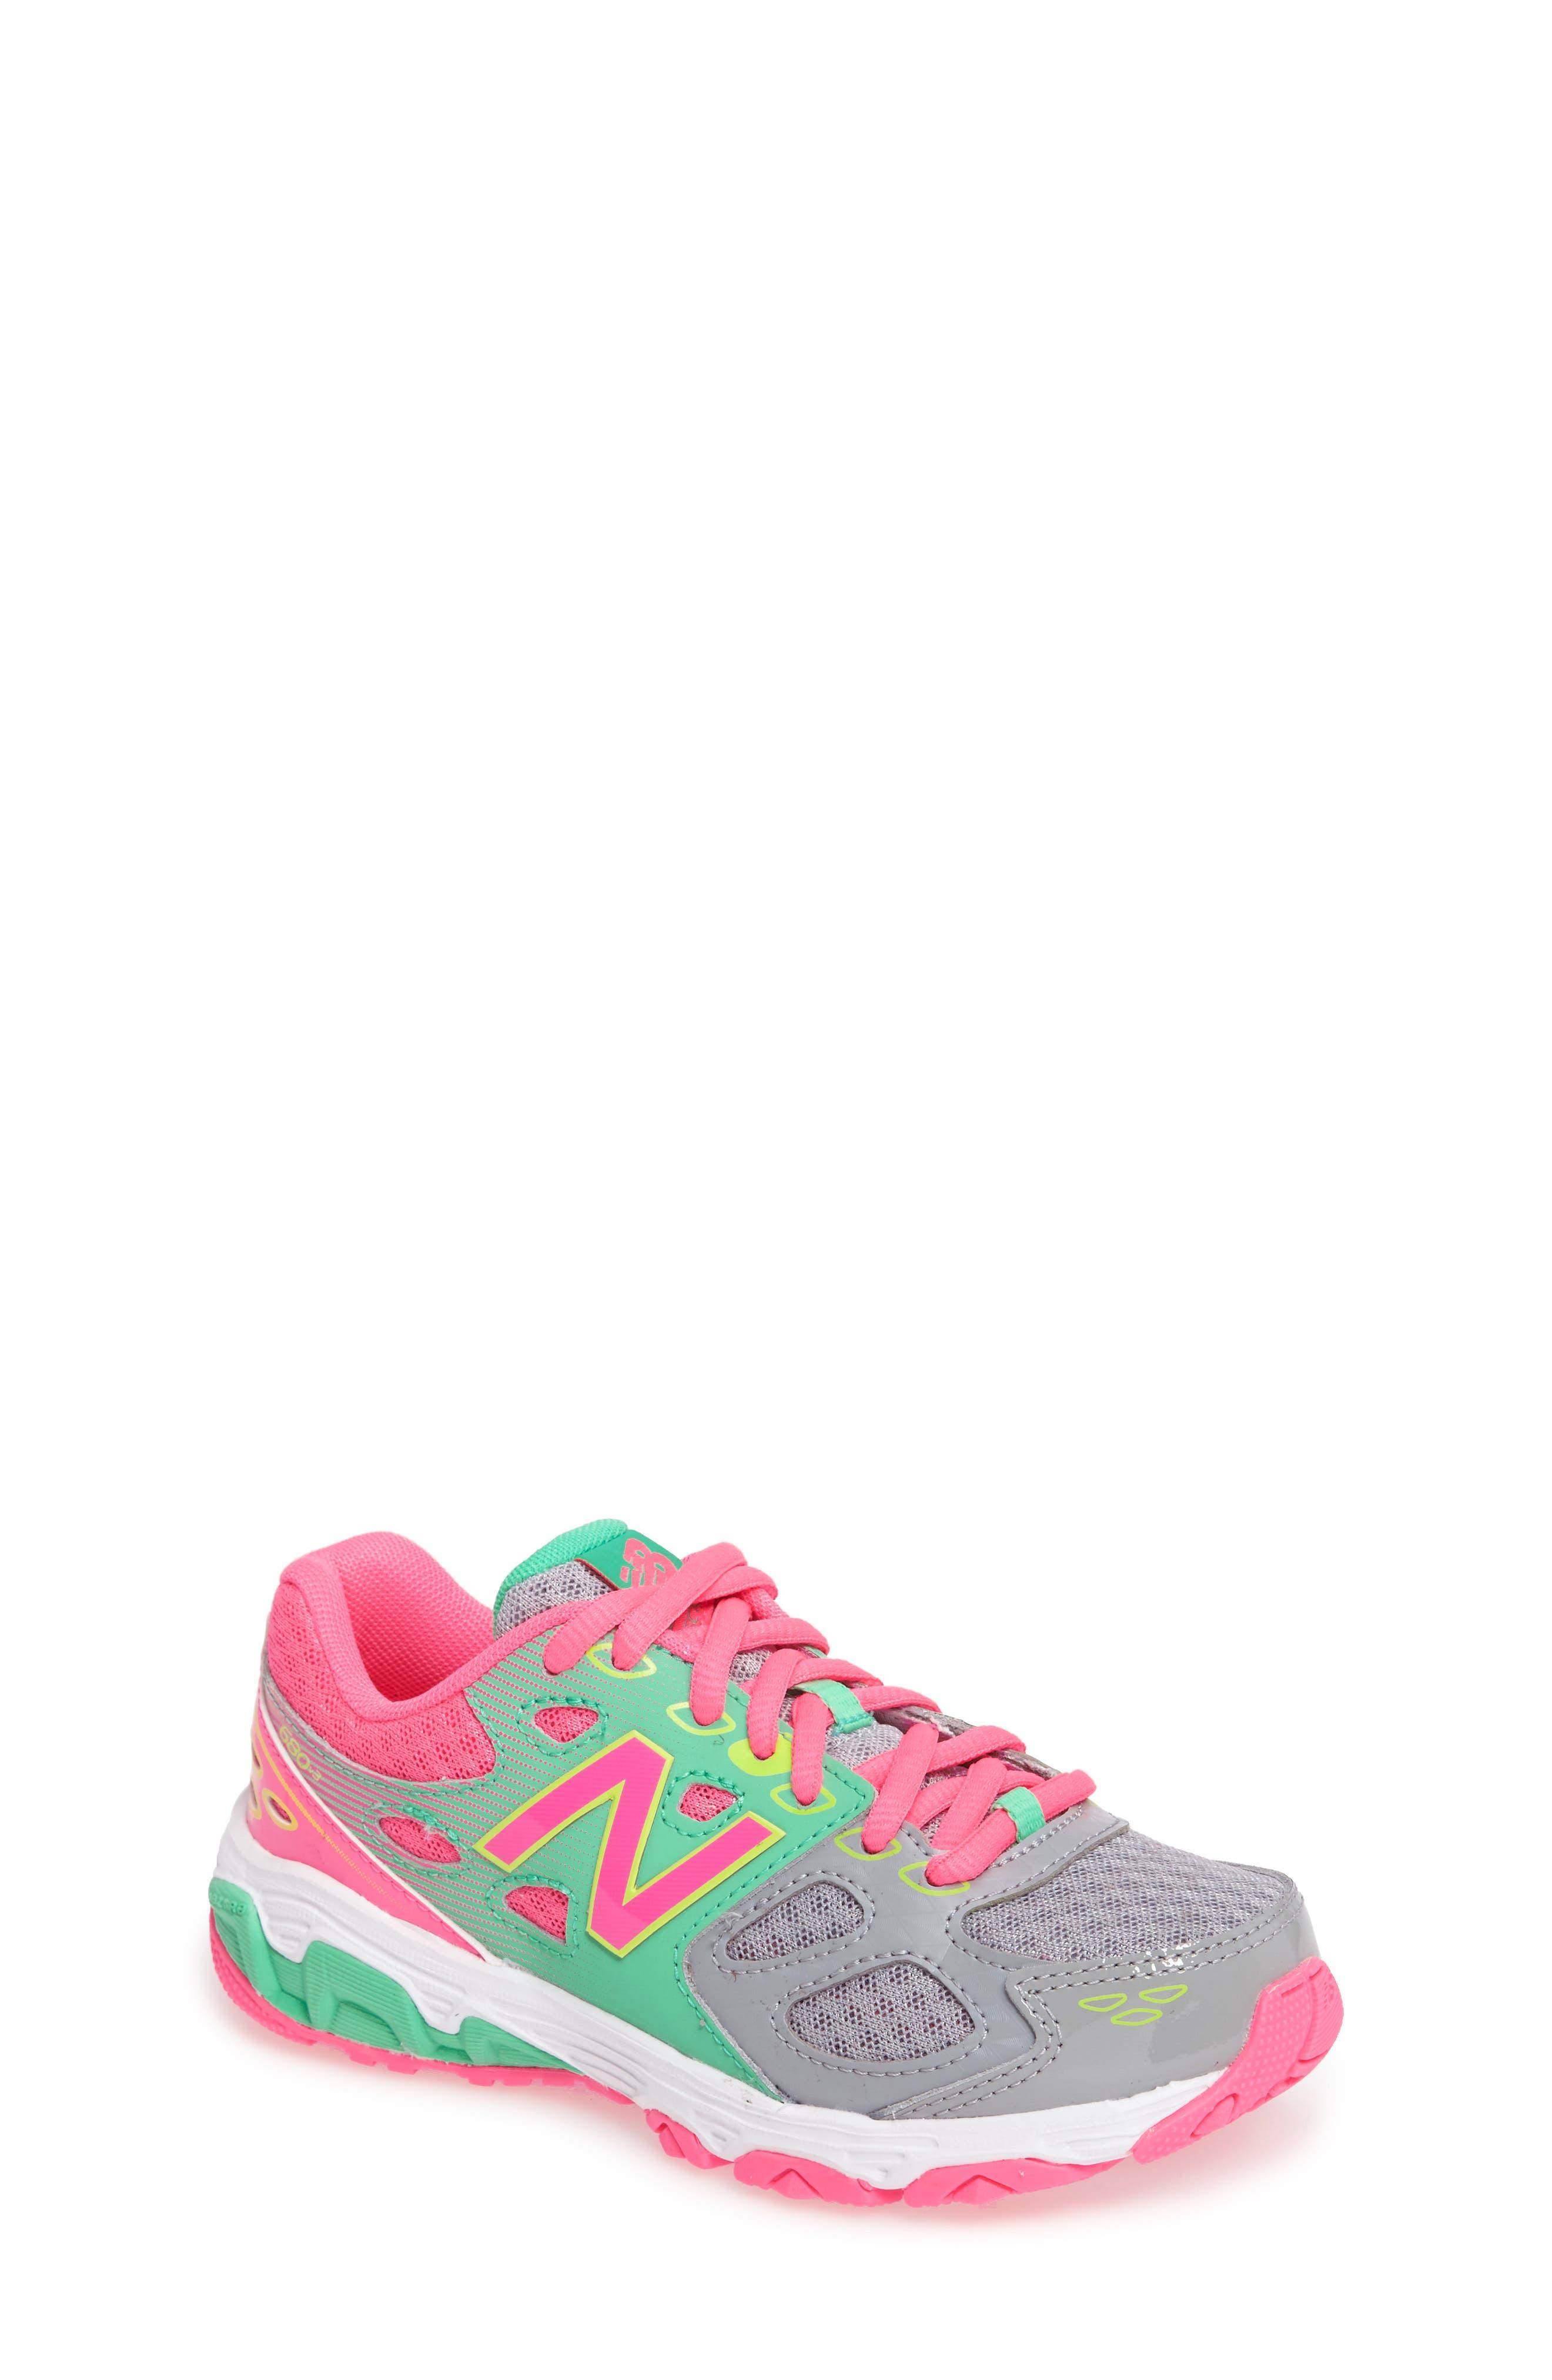 680v3 Sneaker,                             Main thumbnail 1, color,                             026